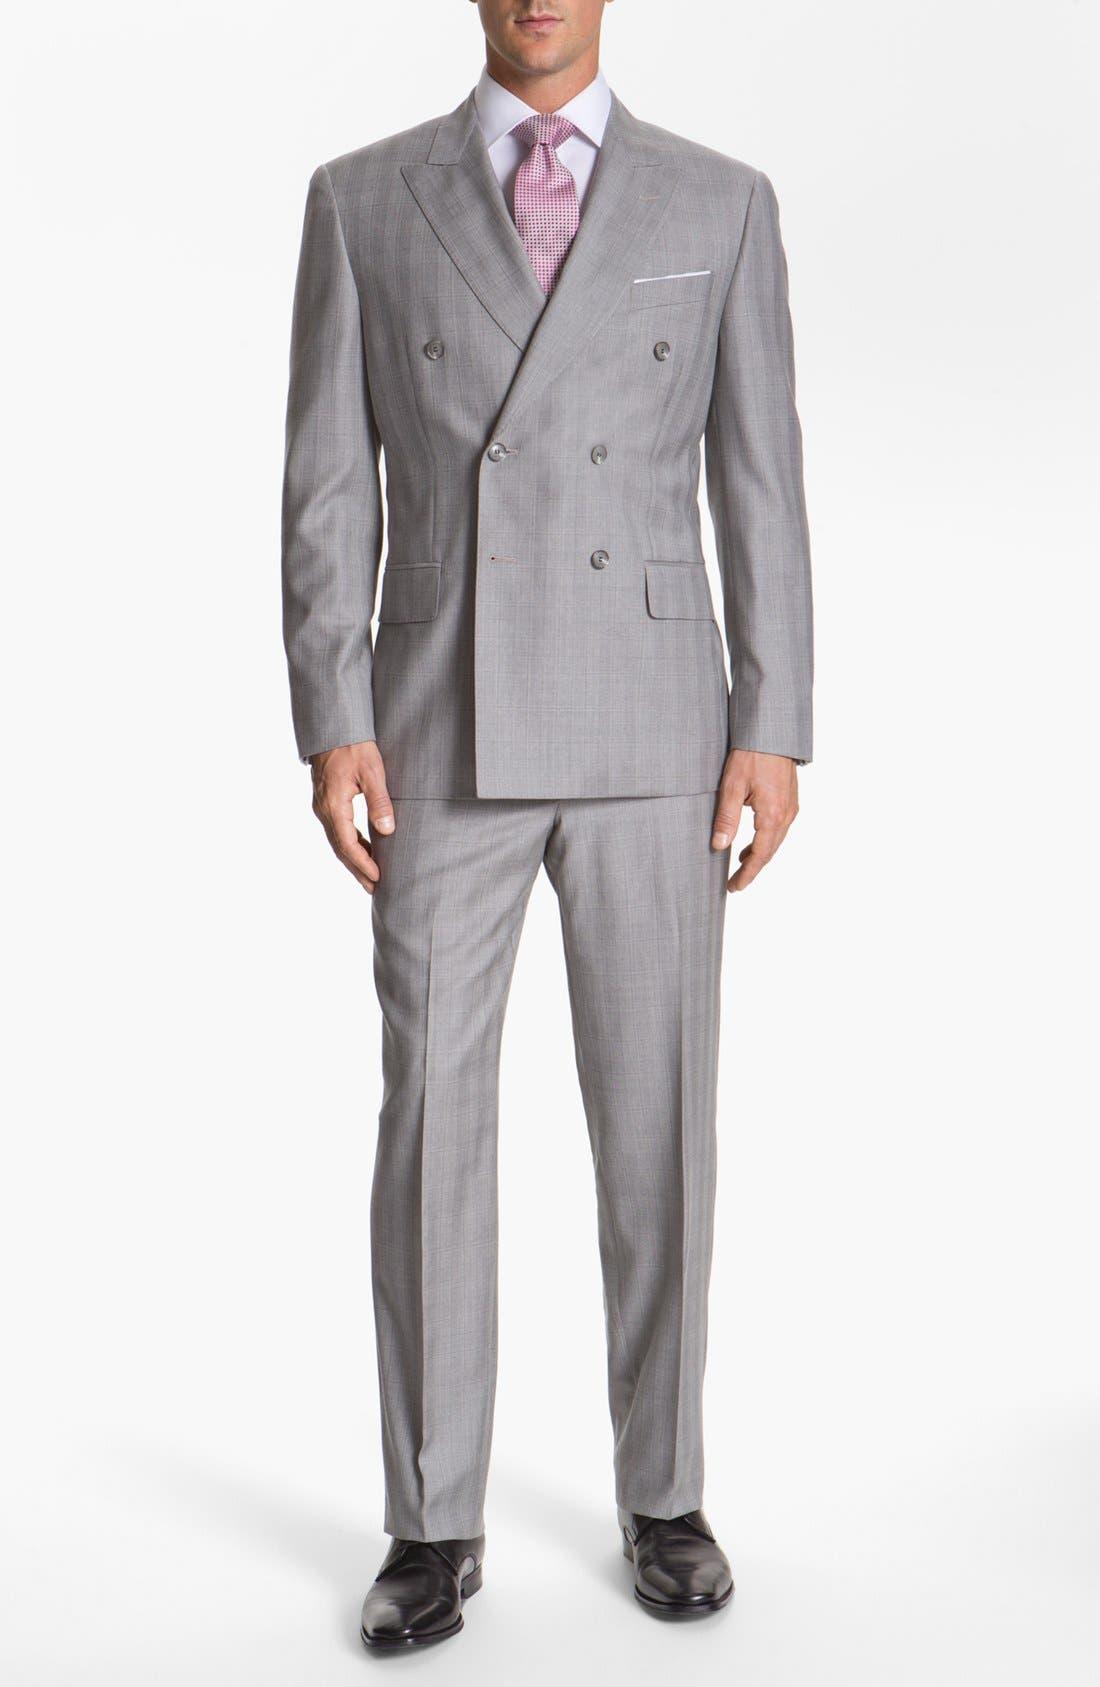 Main Image - Joseph Abboud 'Platinum' Double Breasted Suit